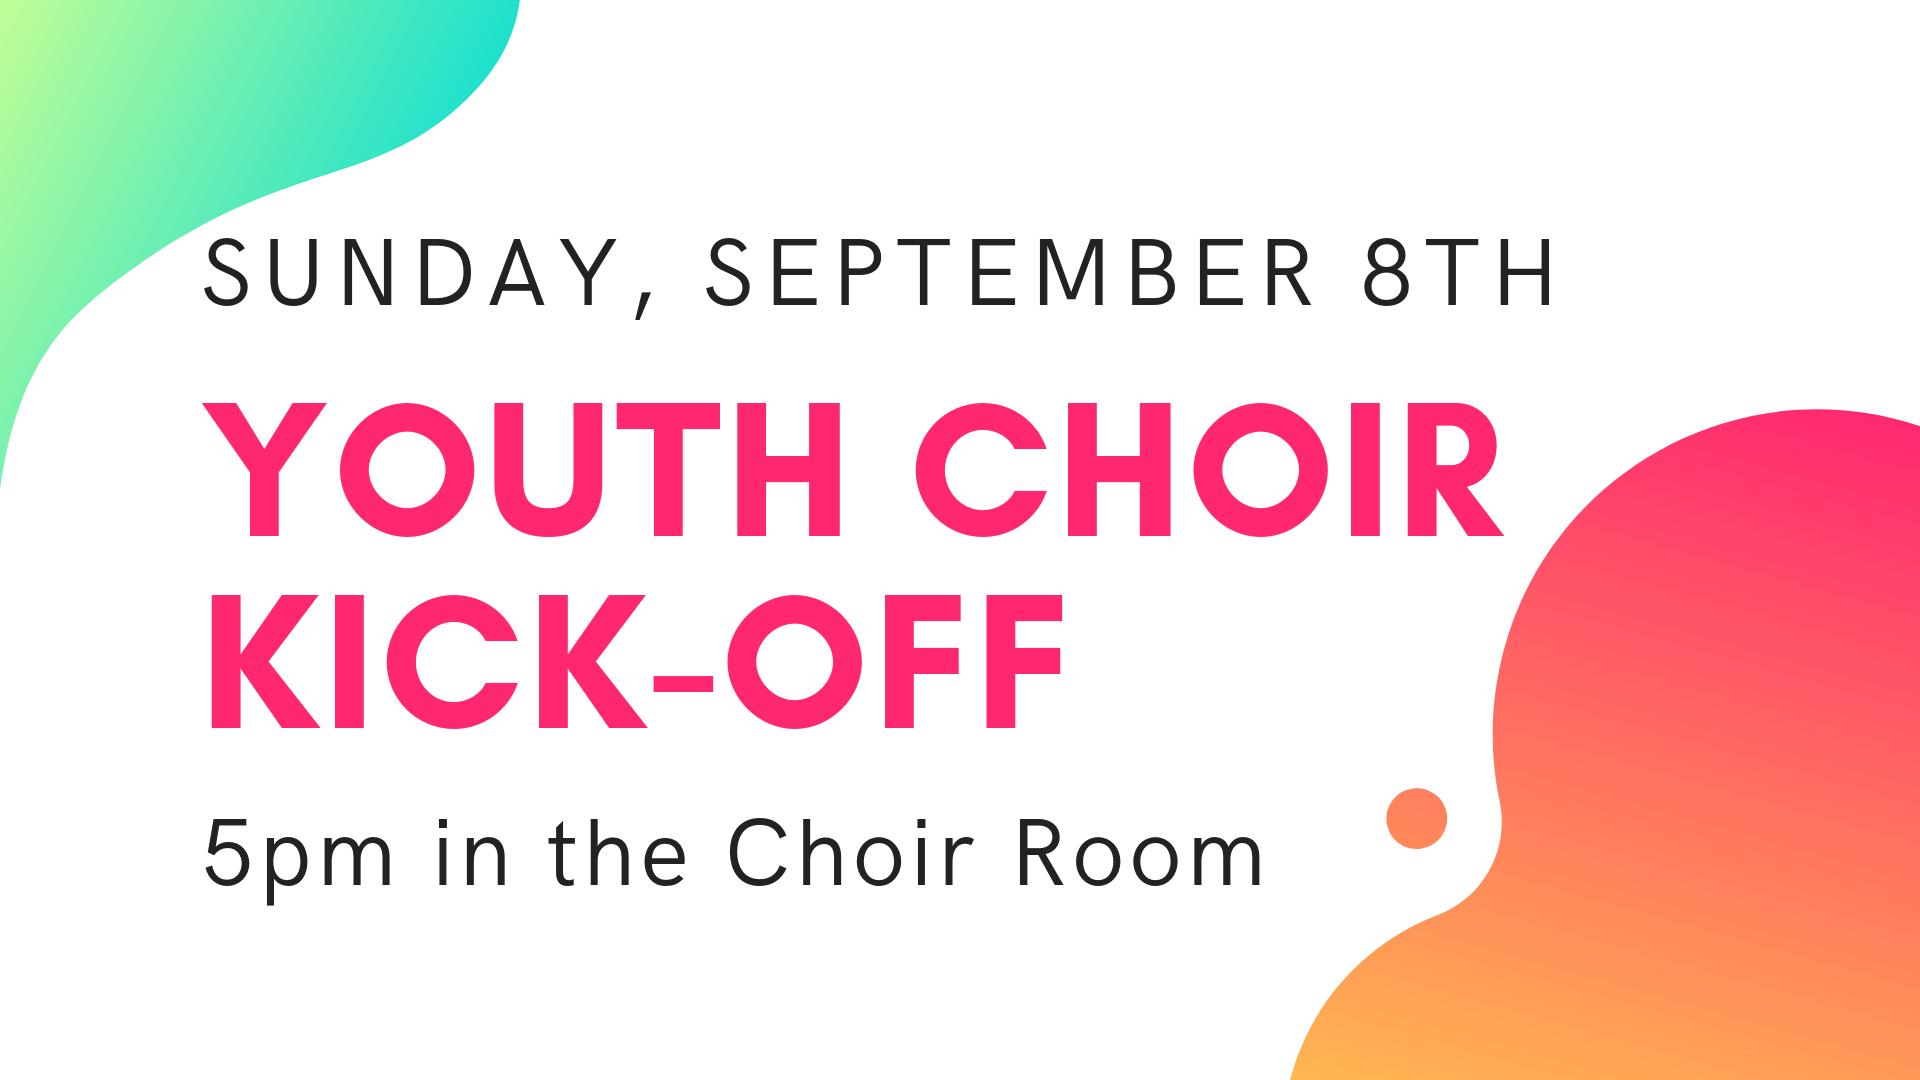 Youth Choir Kick-off.png